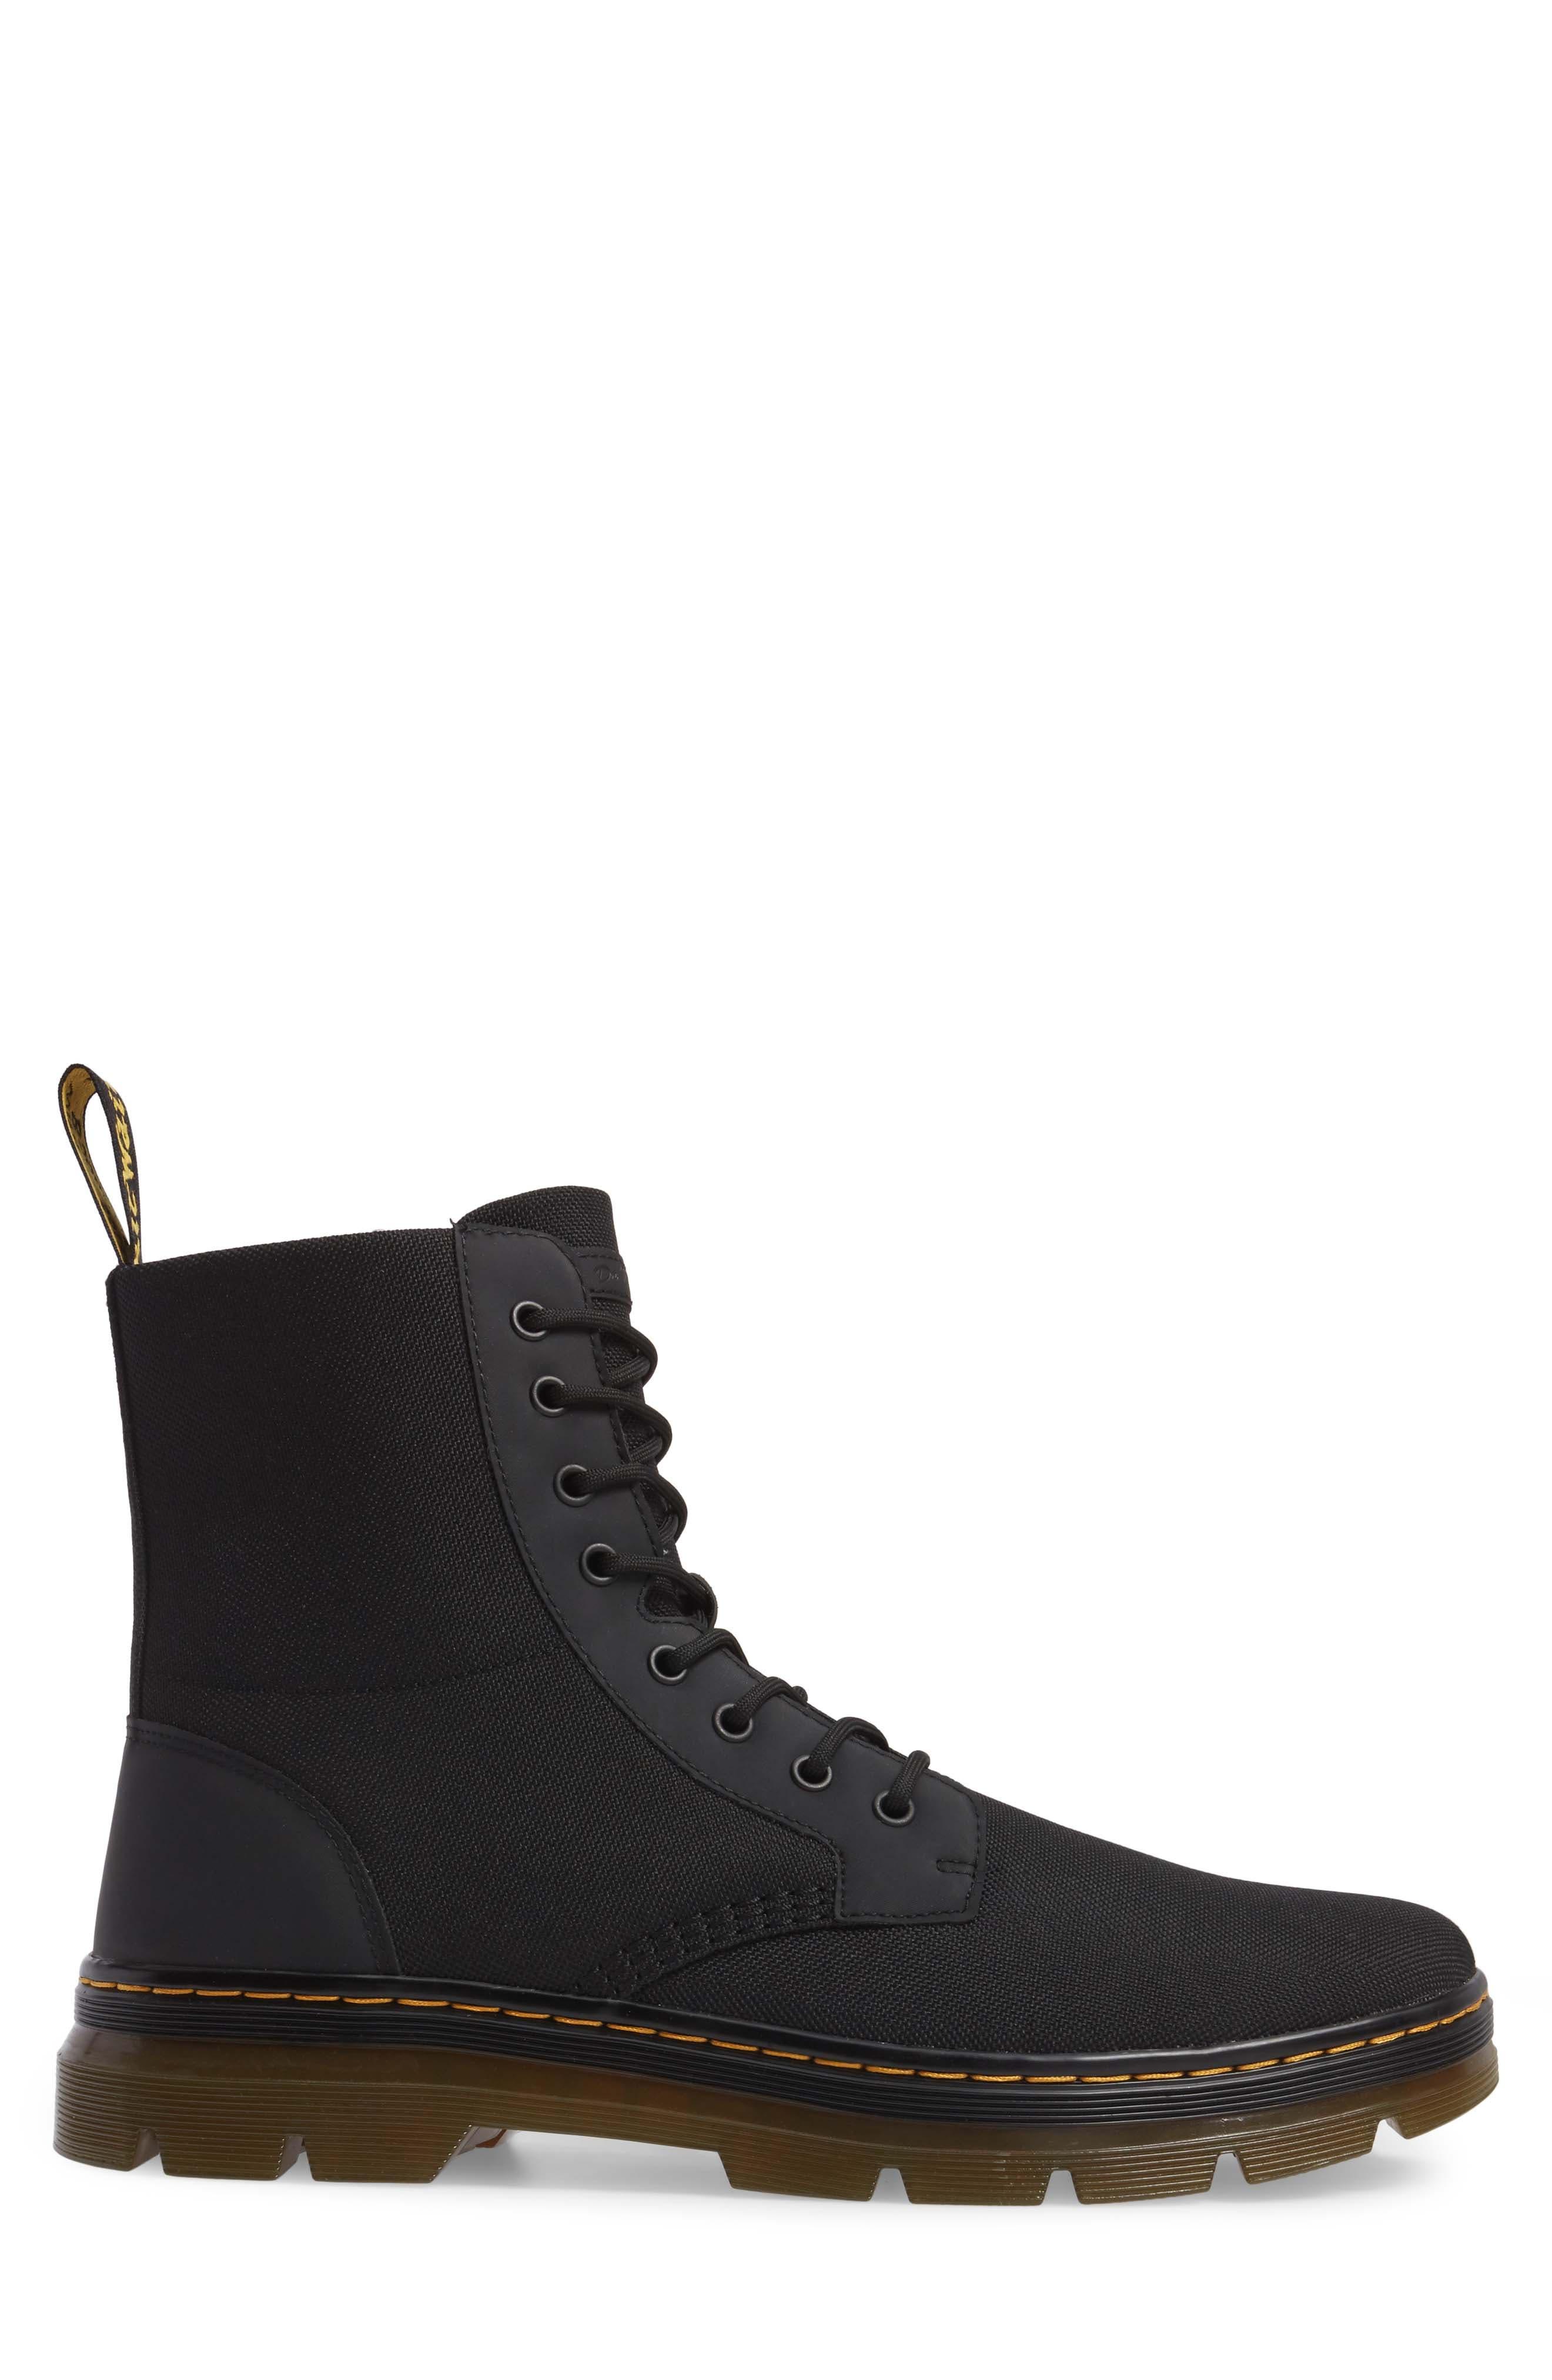 'Combs' Plain Toe Boot,                             Alternate thumbnail 3, color,                             001